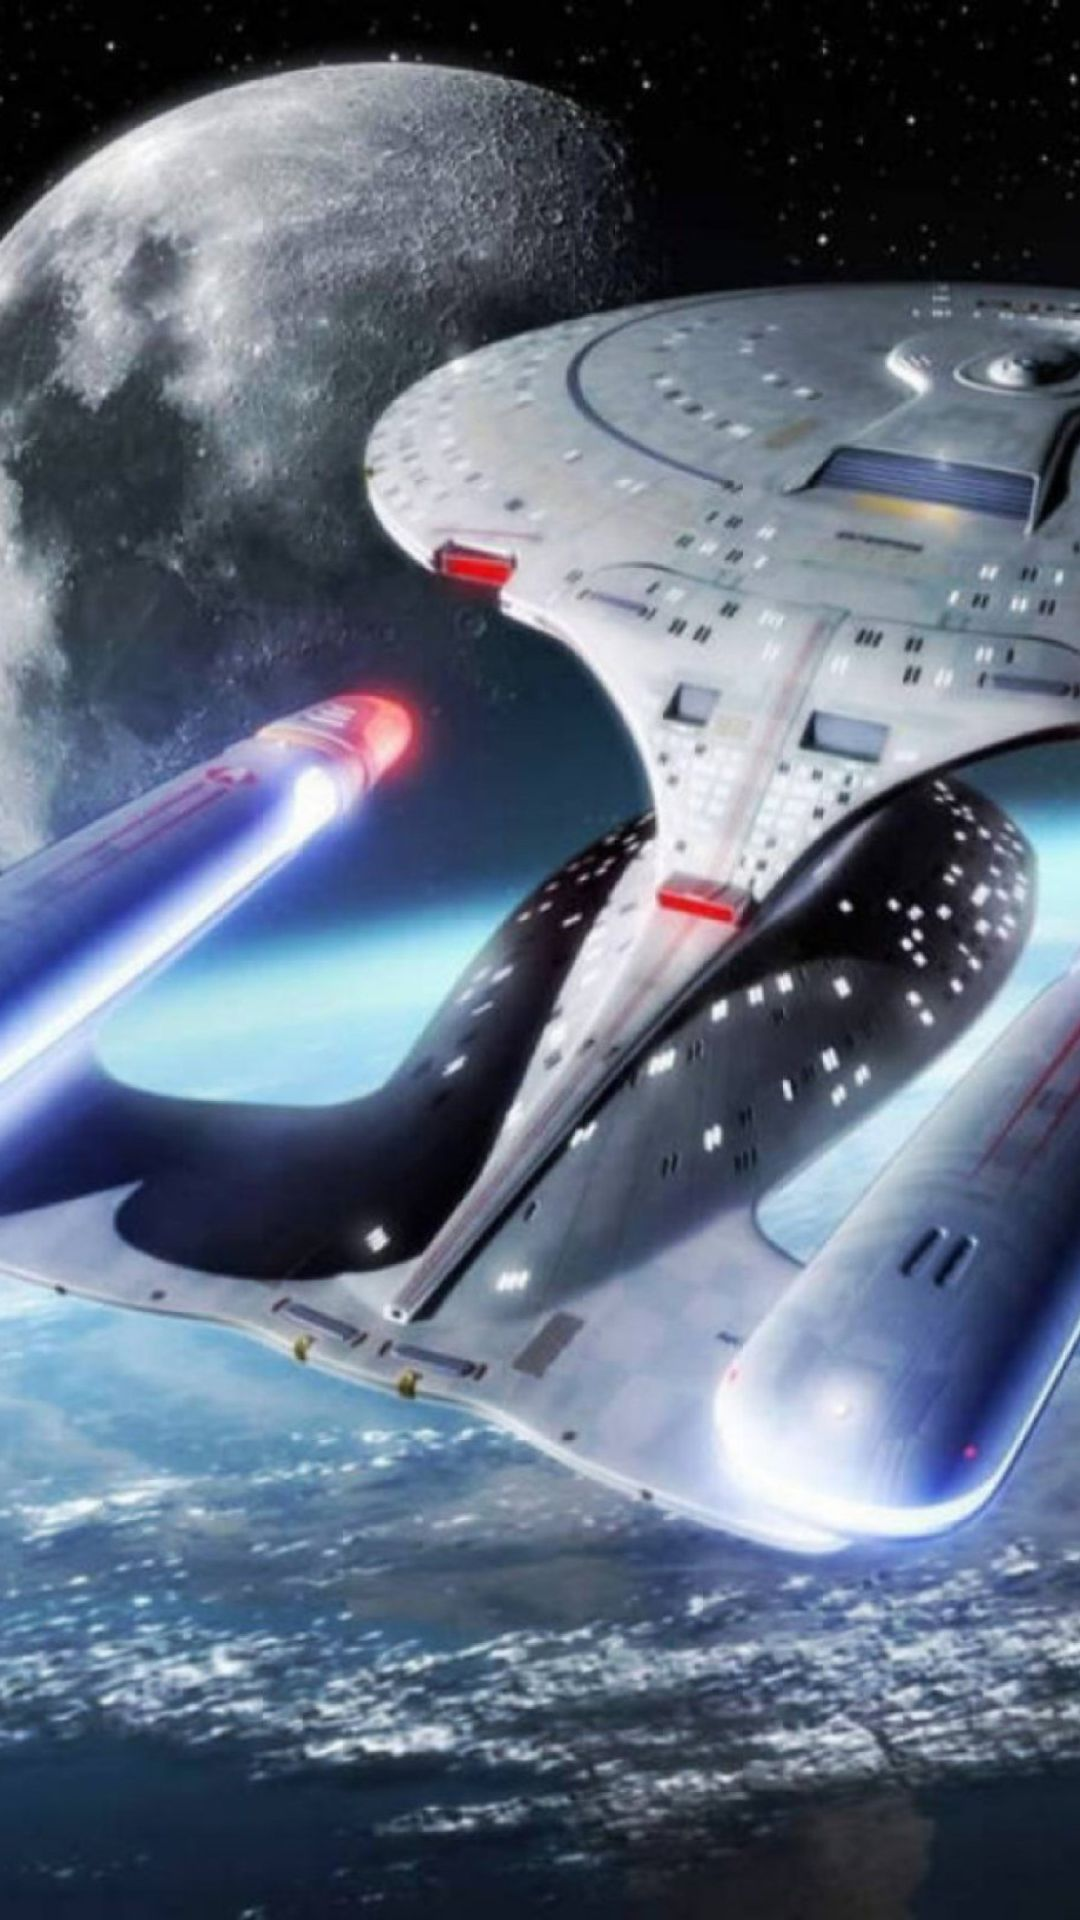 Star Trek Enterprise iPhone Wallpapers   Top Free Star Trek ...